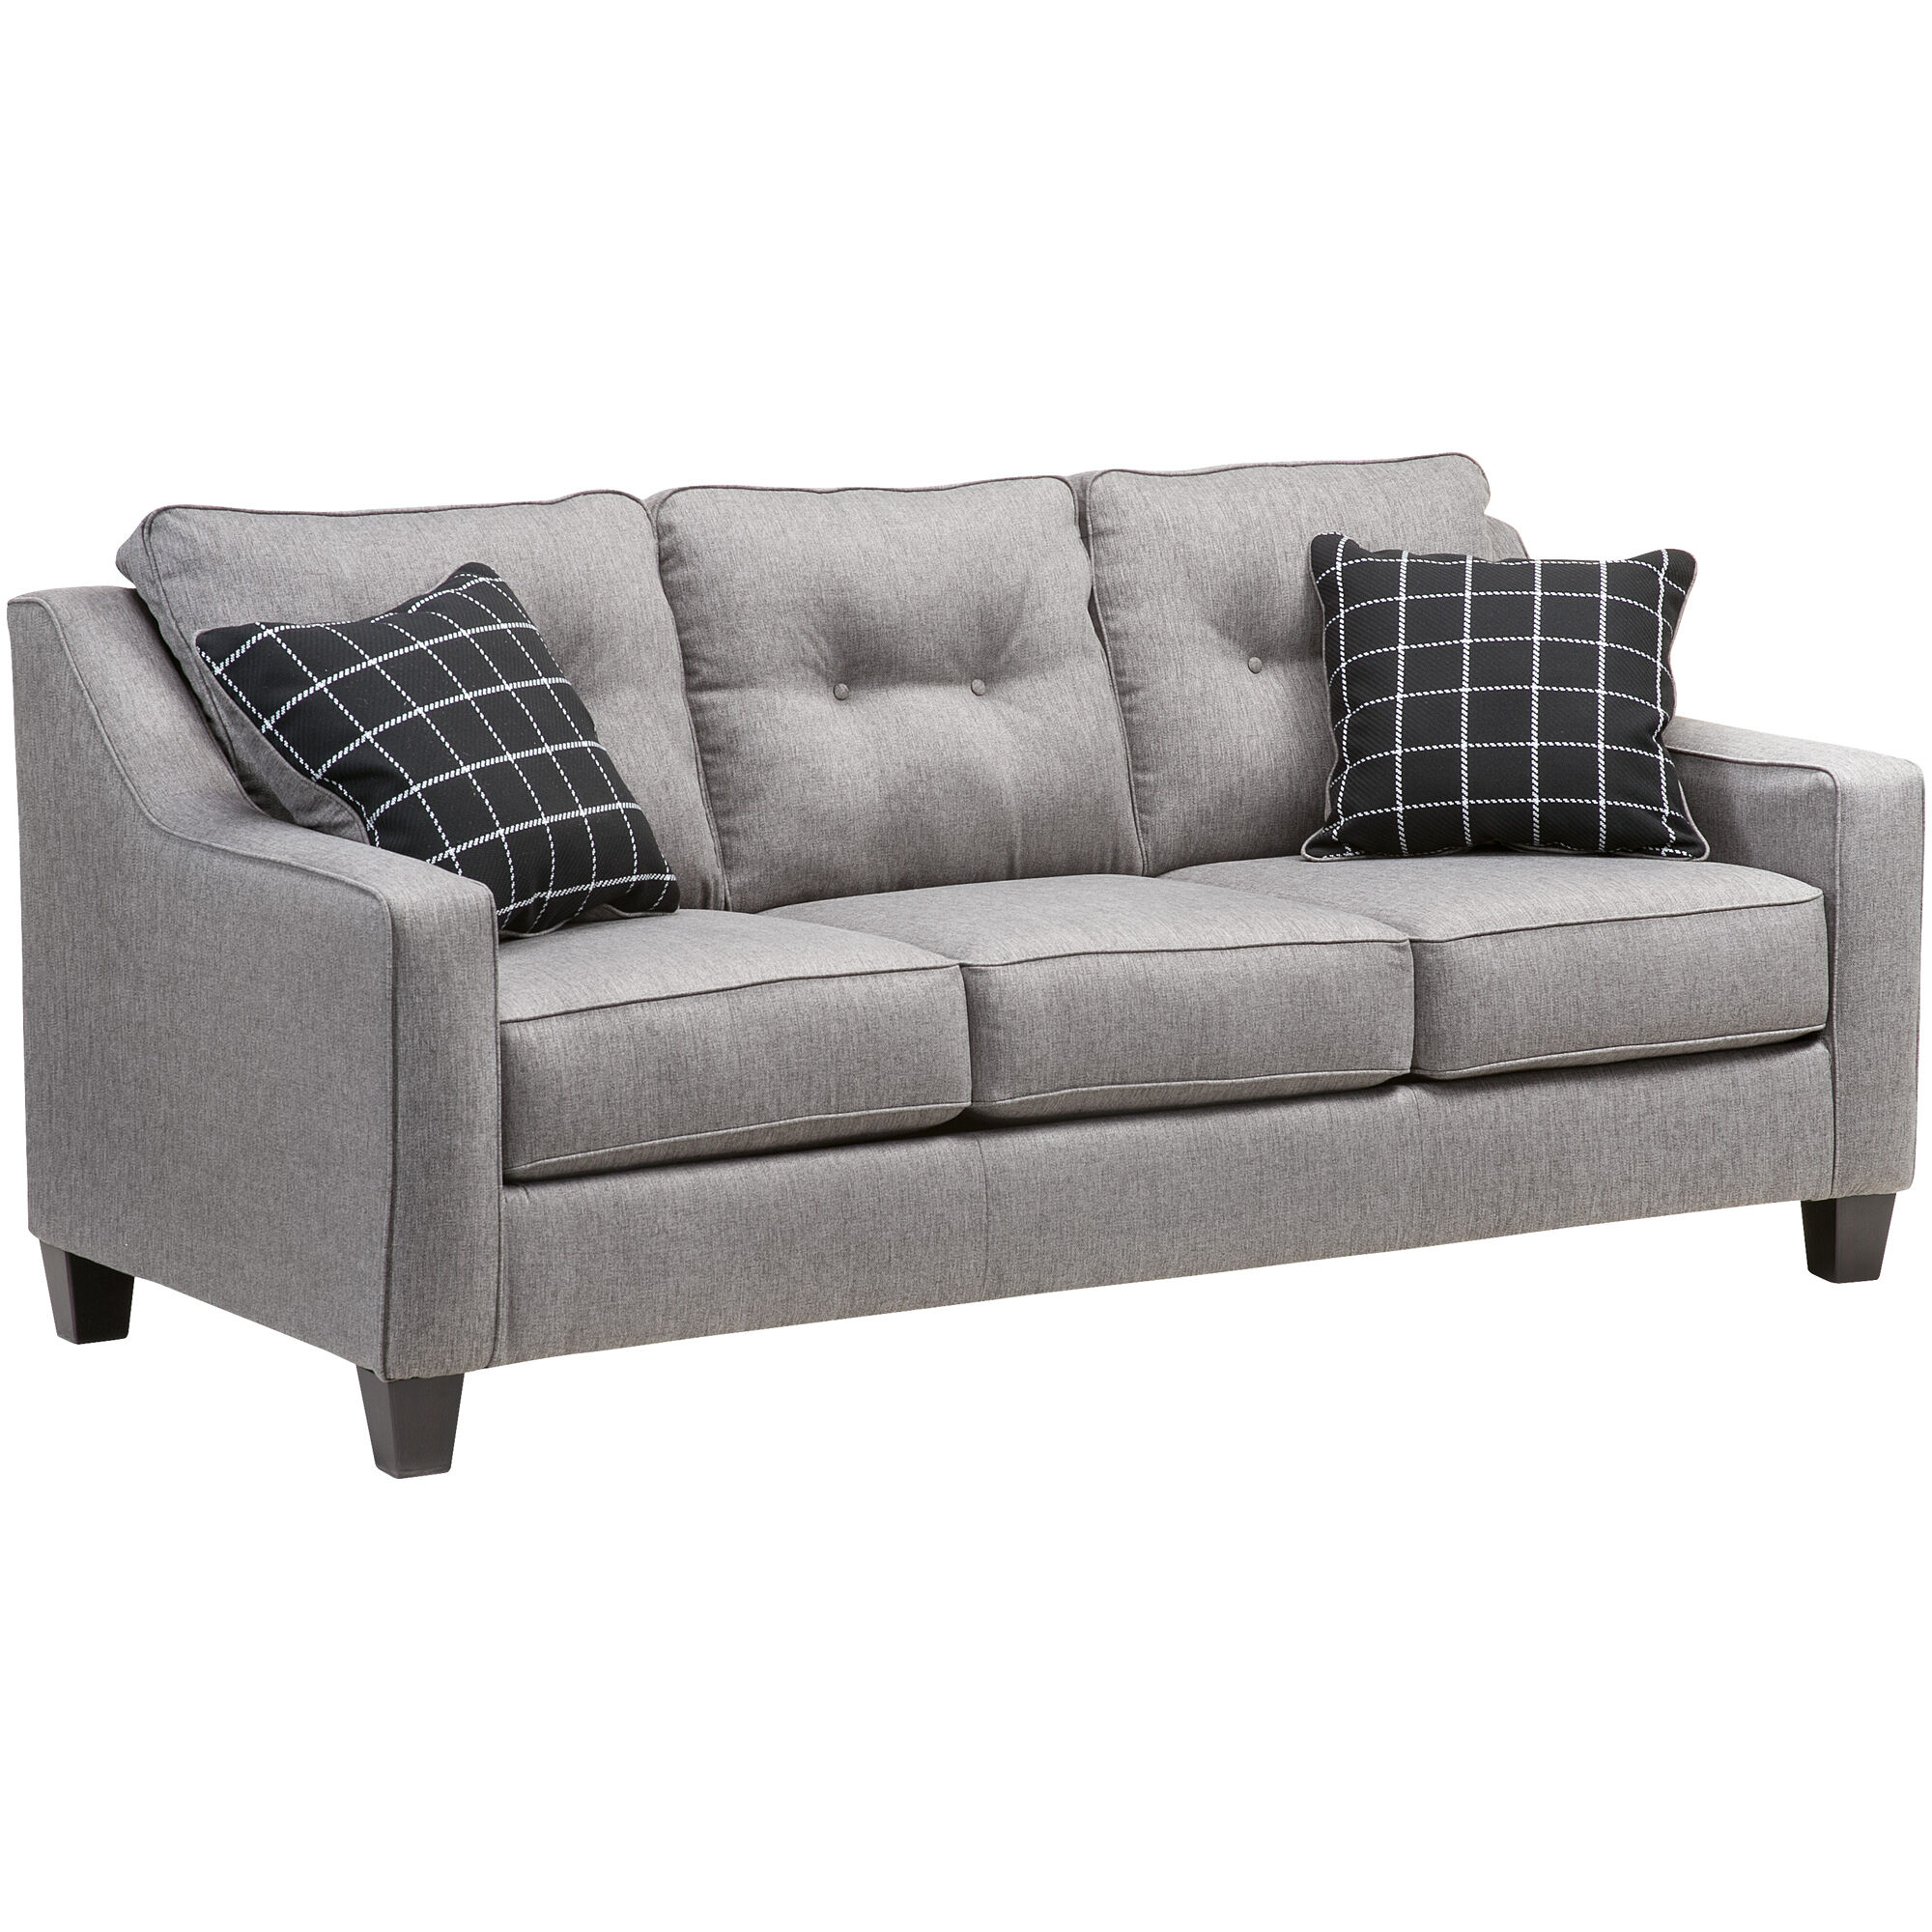 slumberland sofa recliners bed good quality aero gradschoolfairs